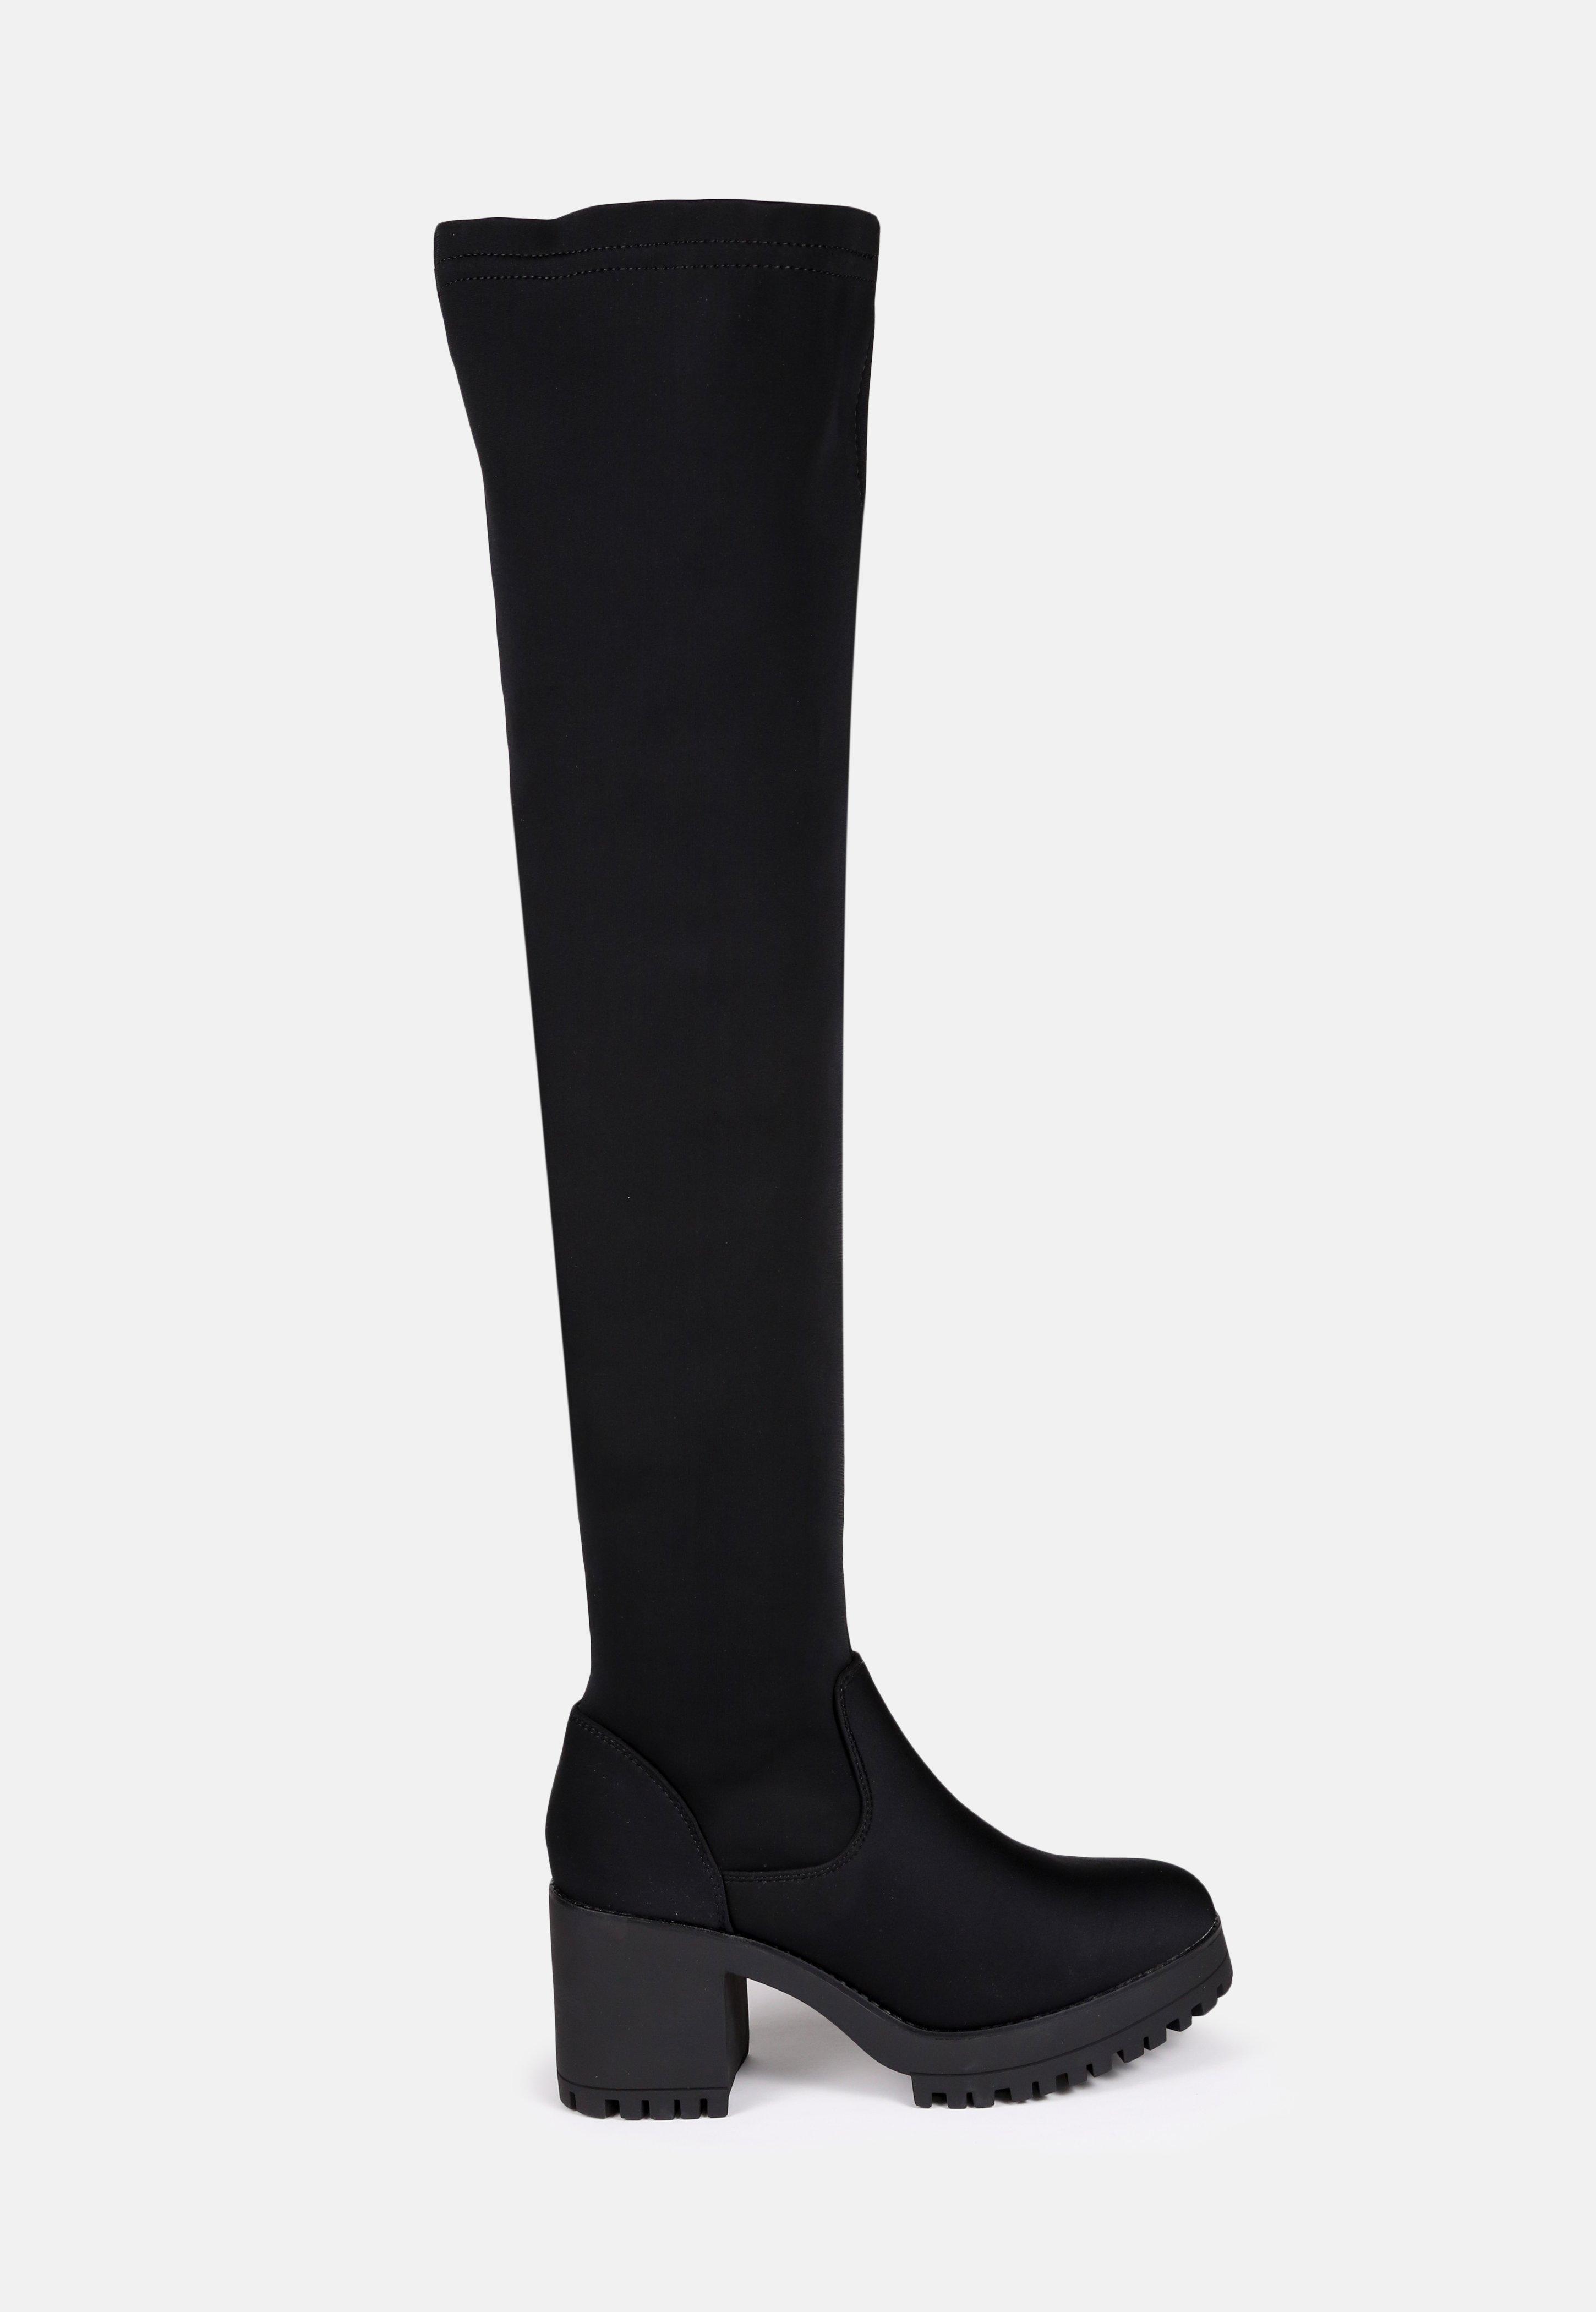 flared heel dance shoes Design Your Own Hat or Uniform Hat Republic